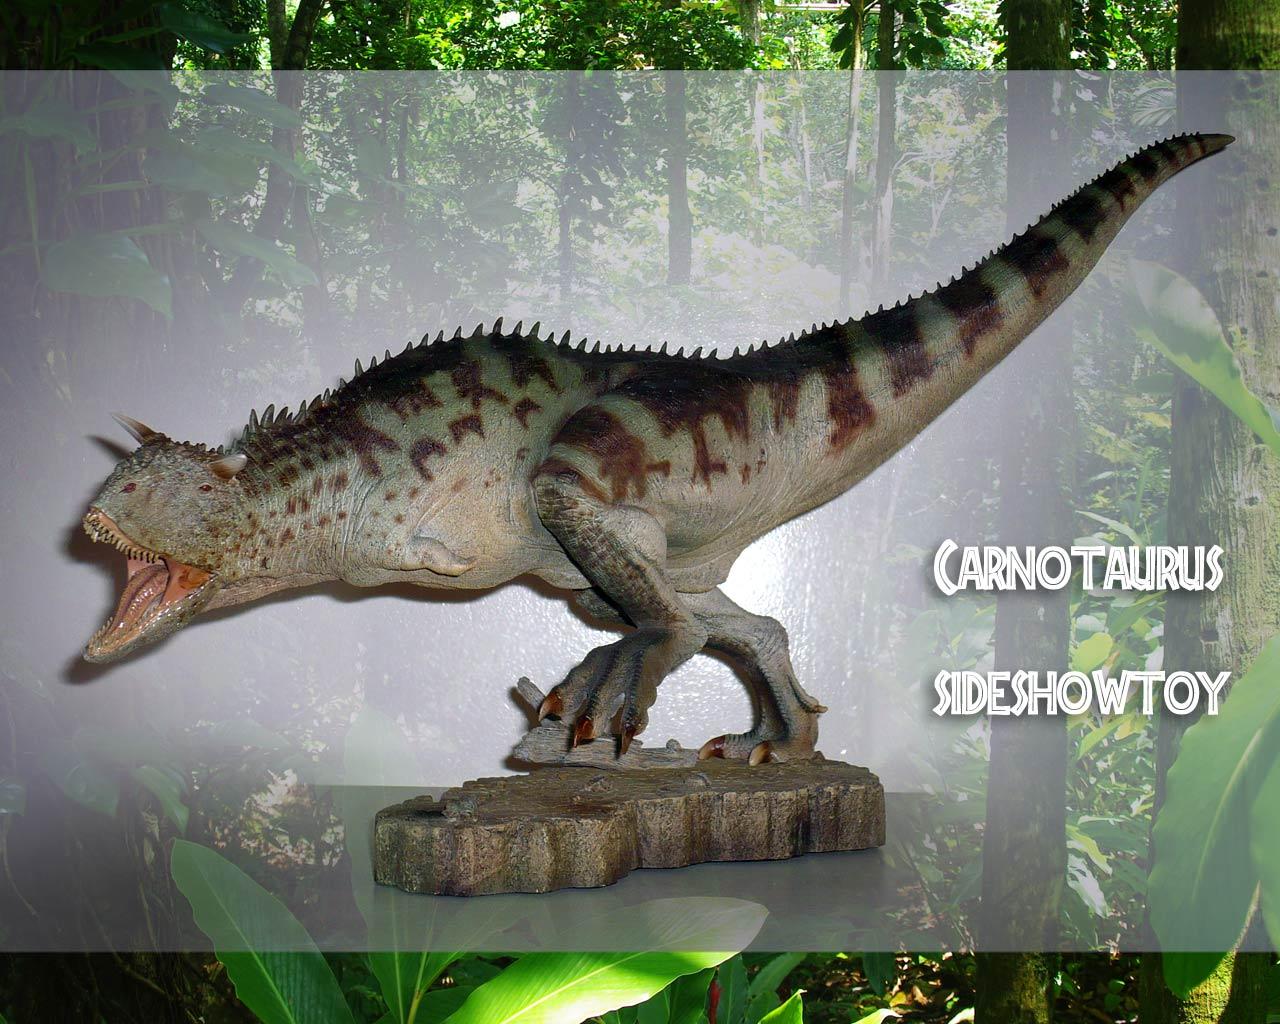 carnotaurussideshow03.jpg